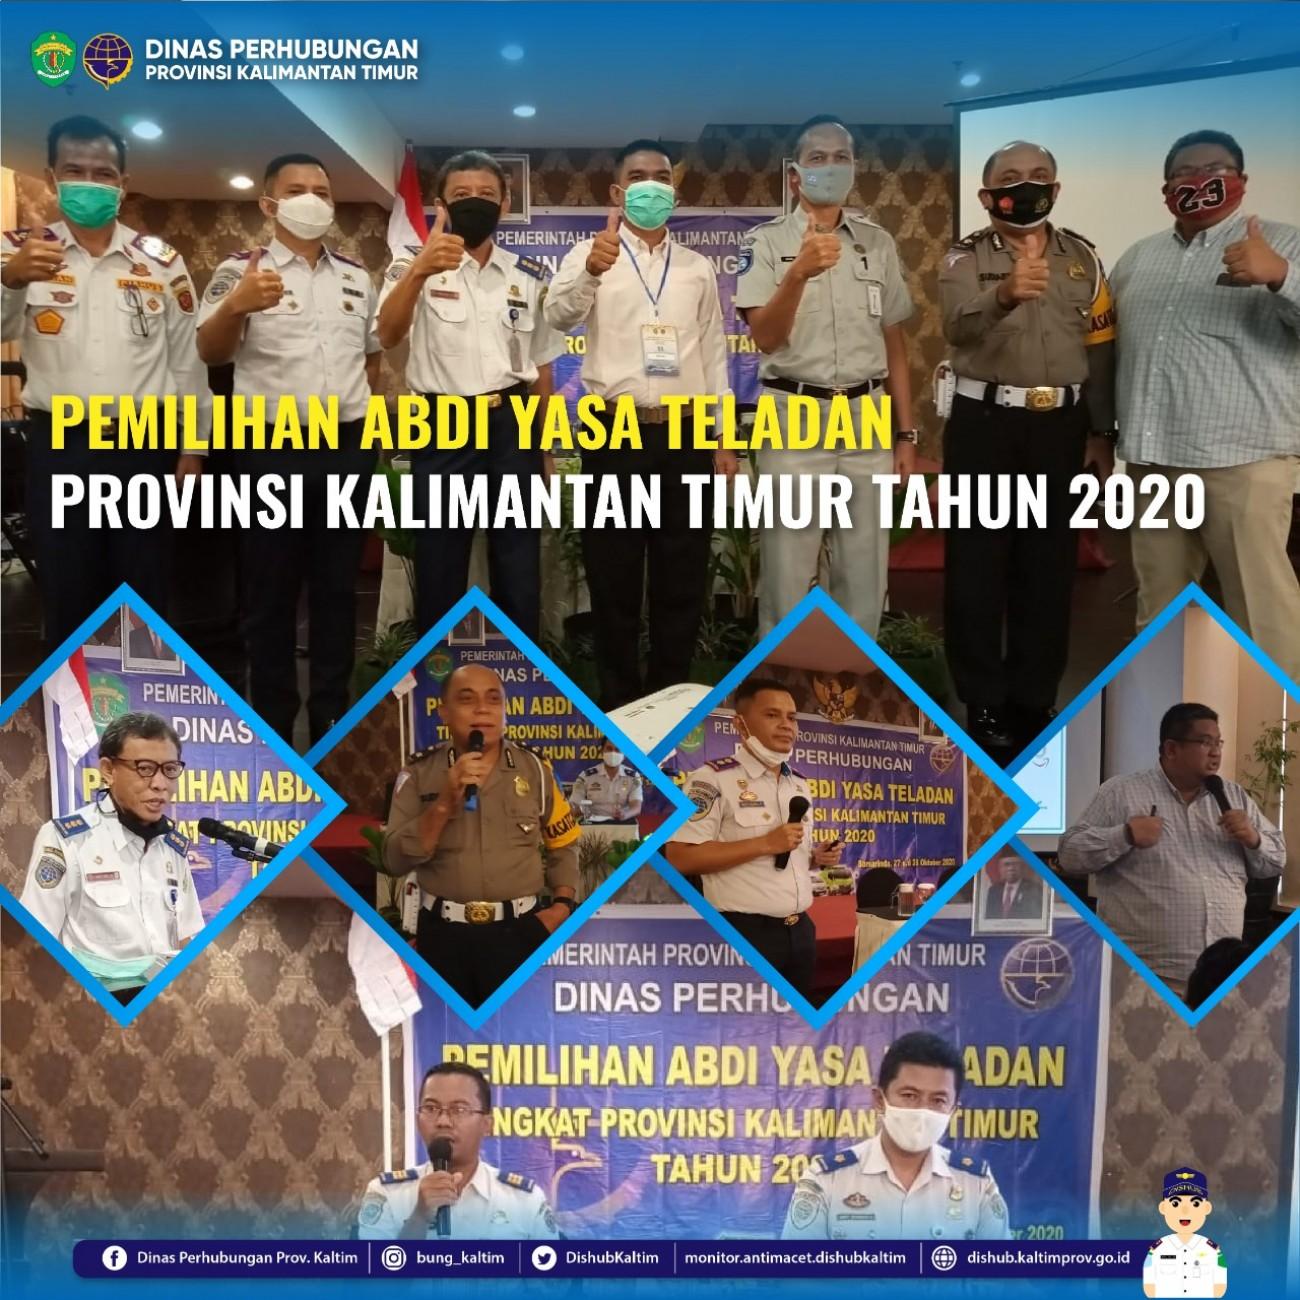 PEMILIHAN ABDI YASA TELADAN TINGKAT PROVINSI KALIMANTAN TIMUR TAHUN 2020